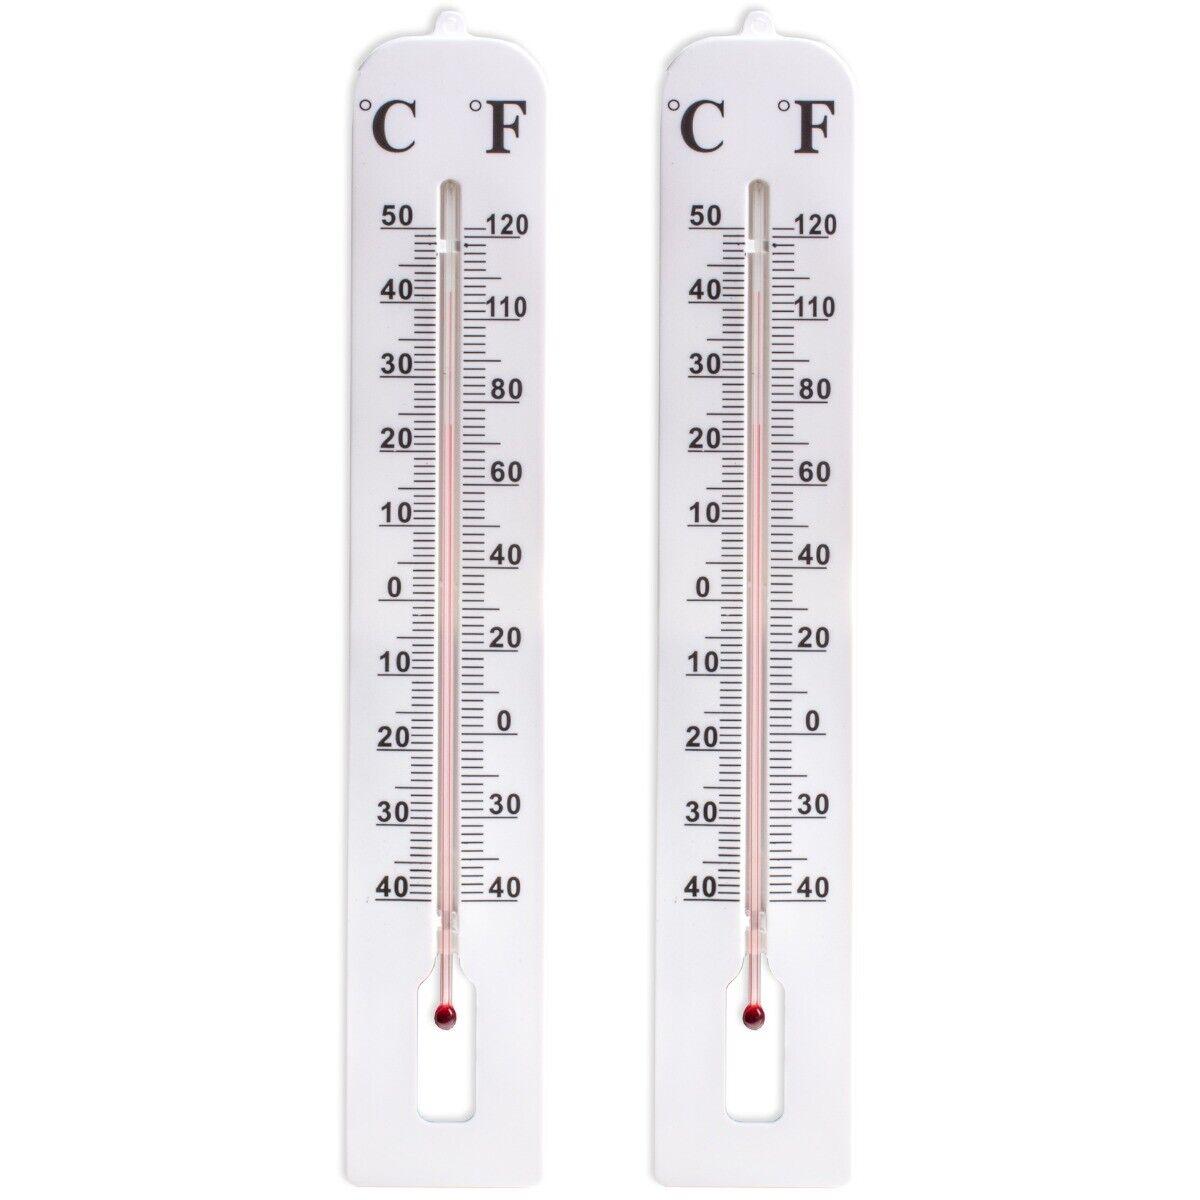 2x LARGE THERMOMETER 40cm Long EASY READ Indoor/Outdoor Garden Temperature Gauge